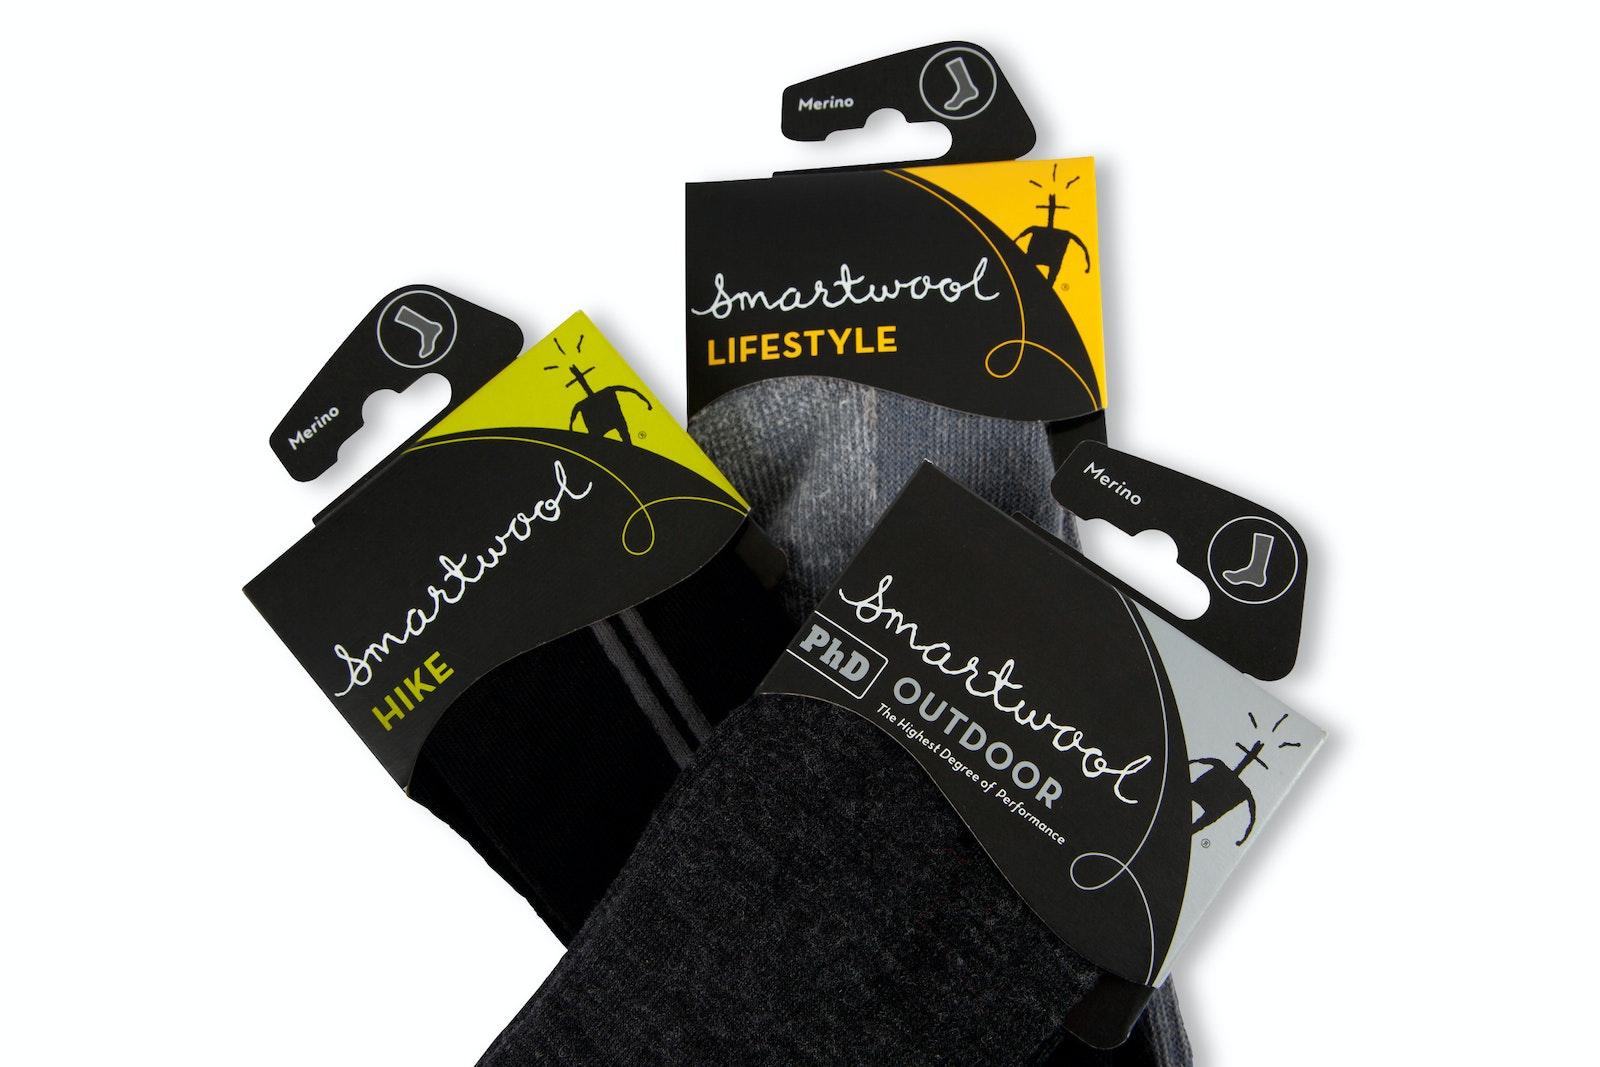 Smartwool socks three close